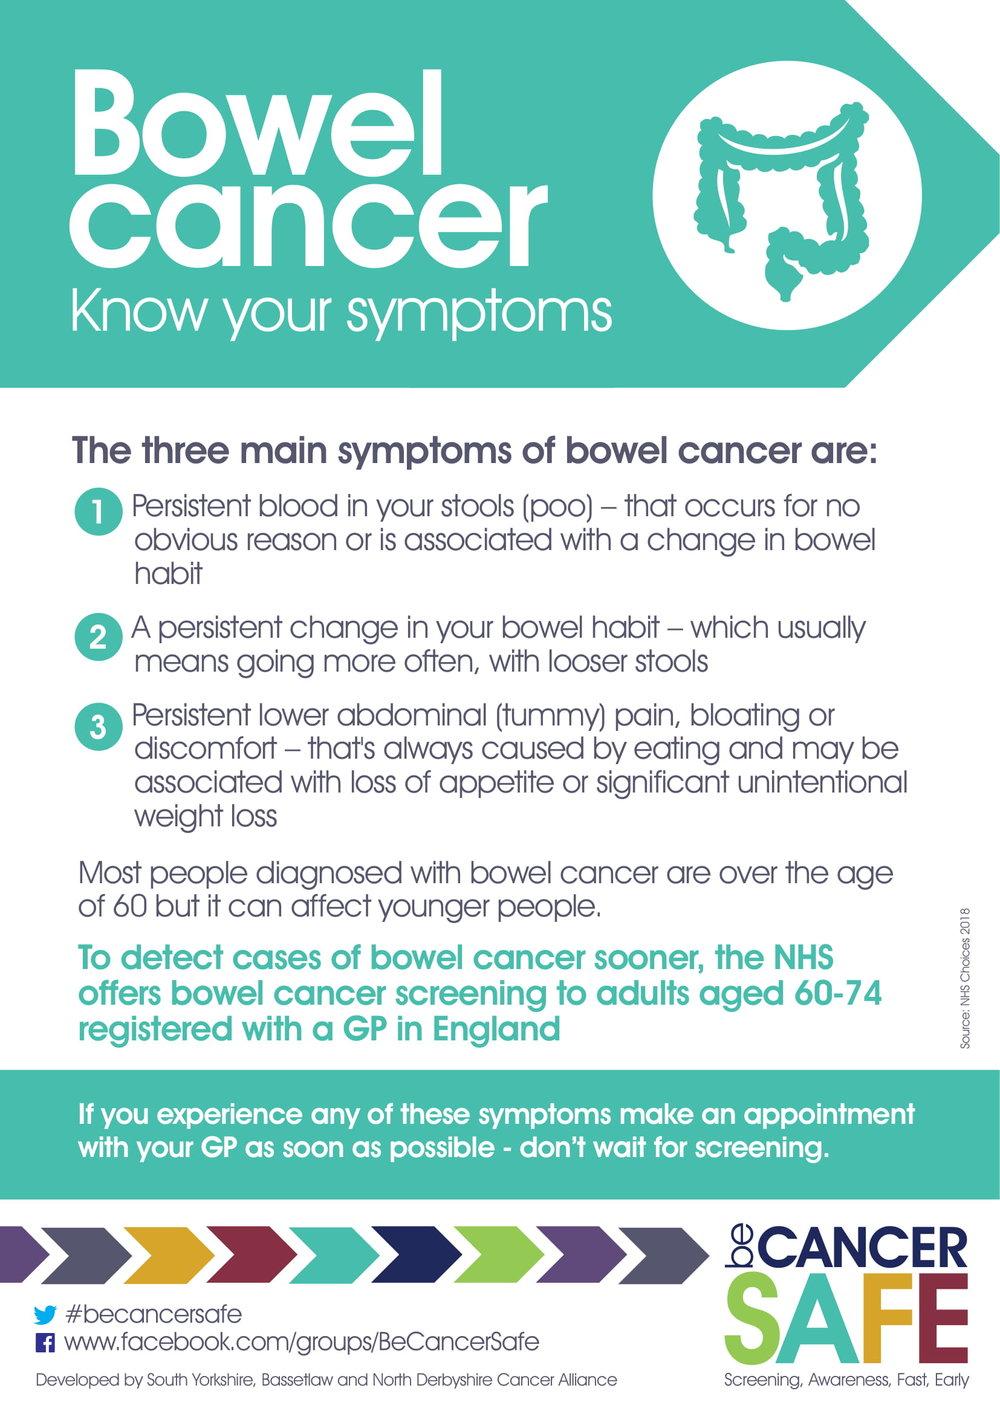 bowel_cancer_poster_copy-1.jpg